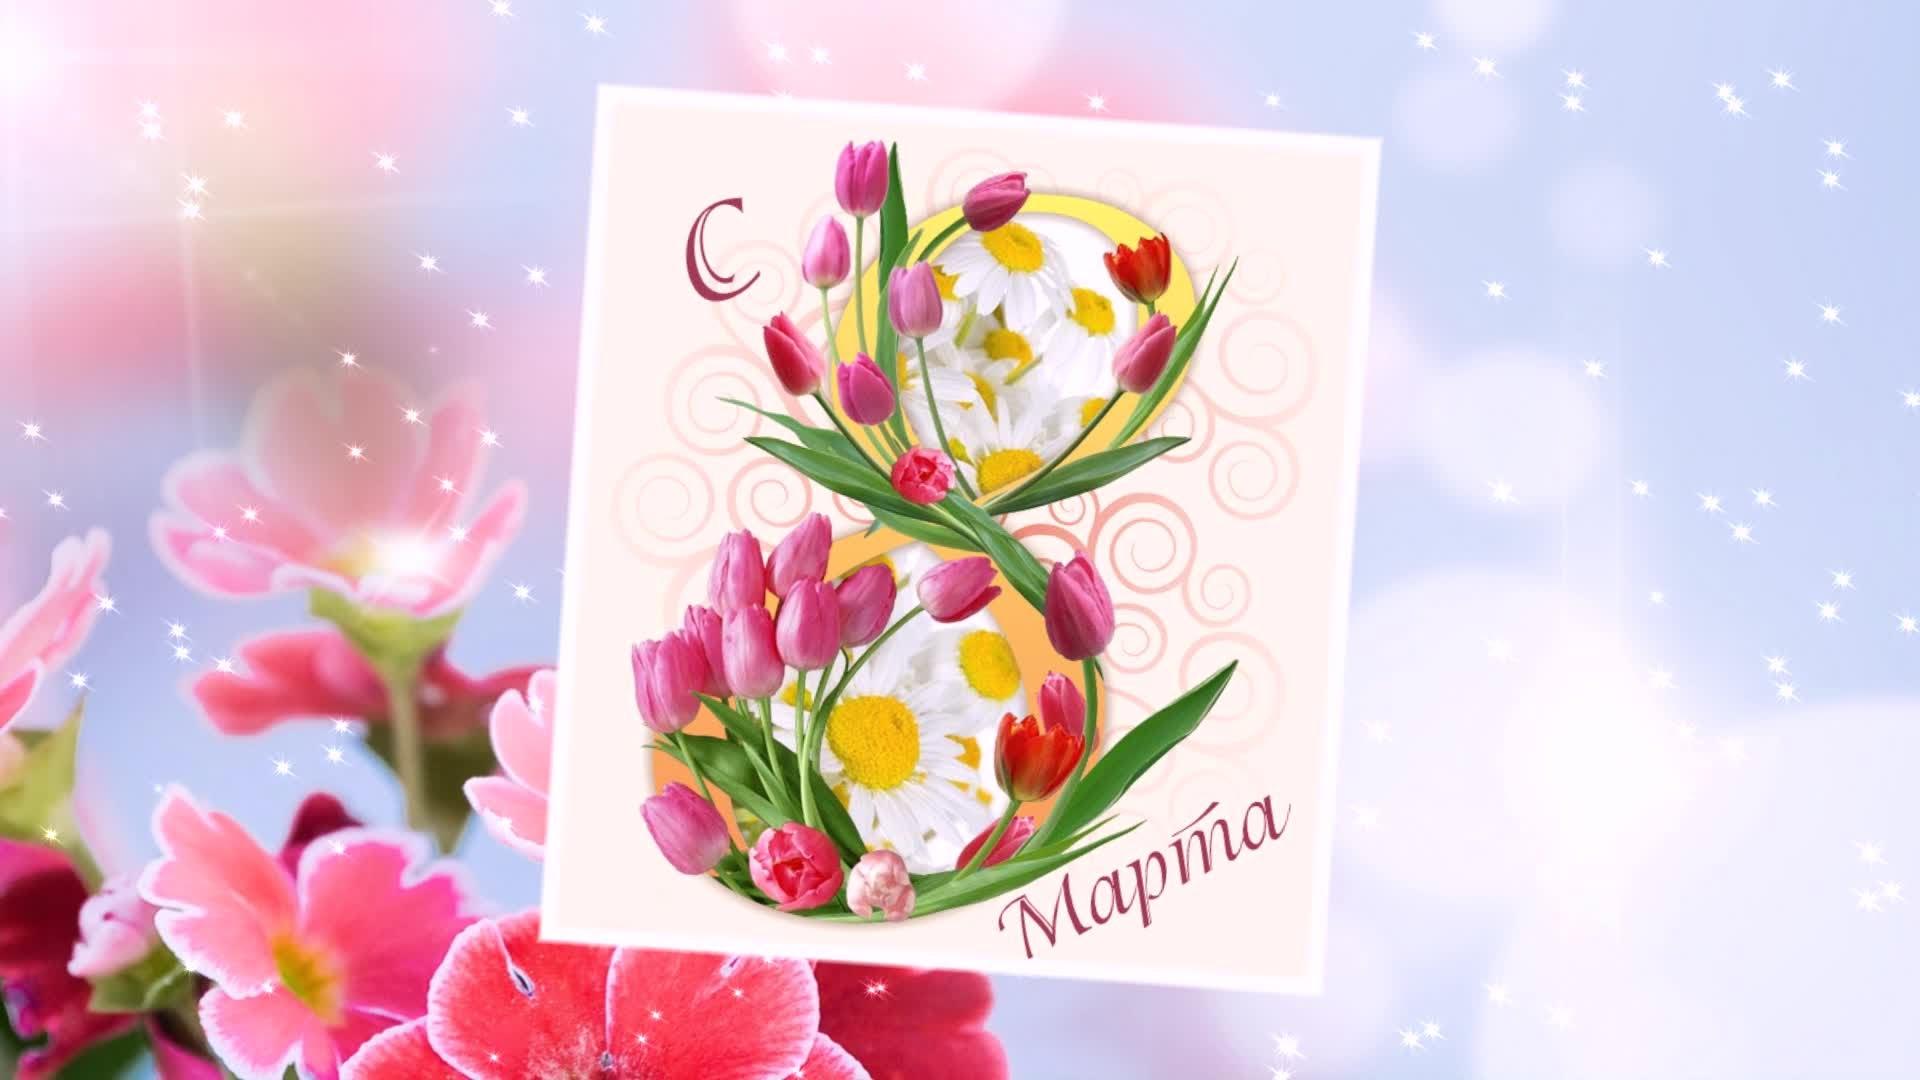 Тебе картинках, интернет открытка 8 марта